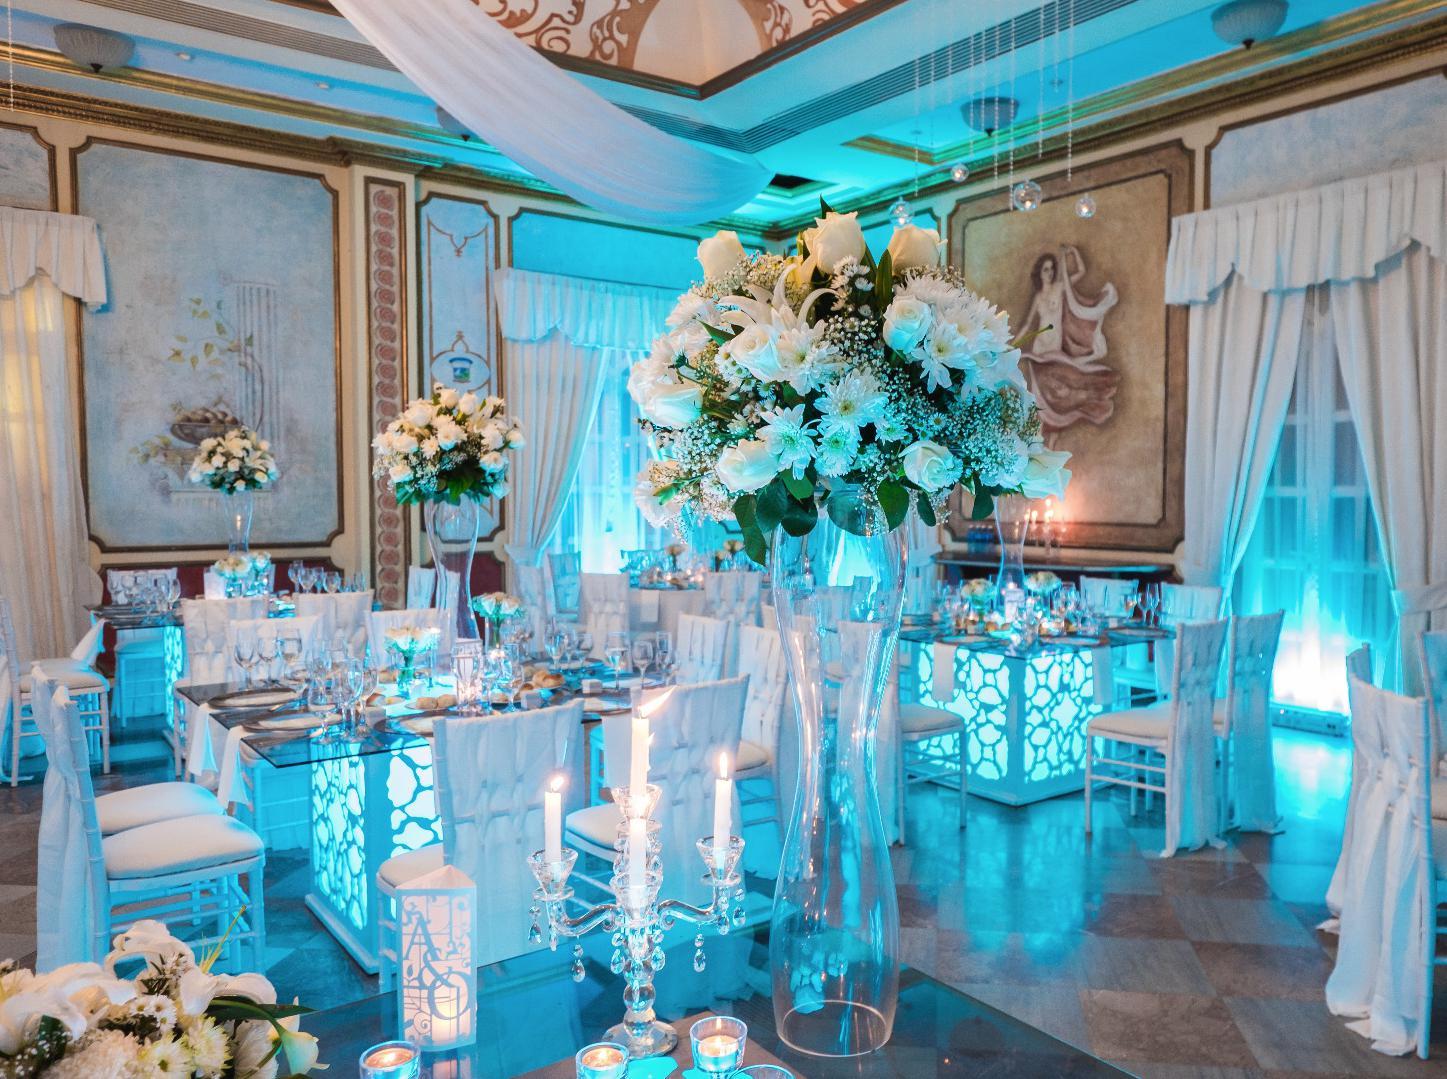 bodas-sin-clasificar-sin-tema-cuba-30861.jpg